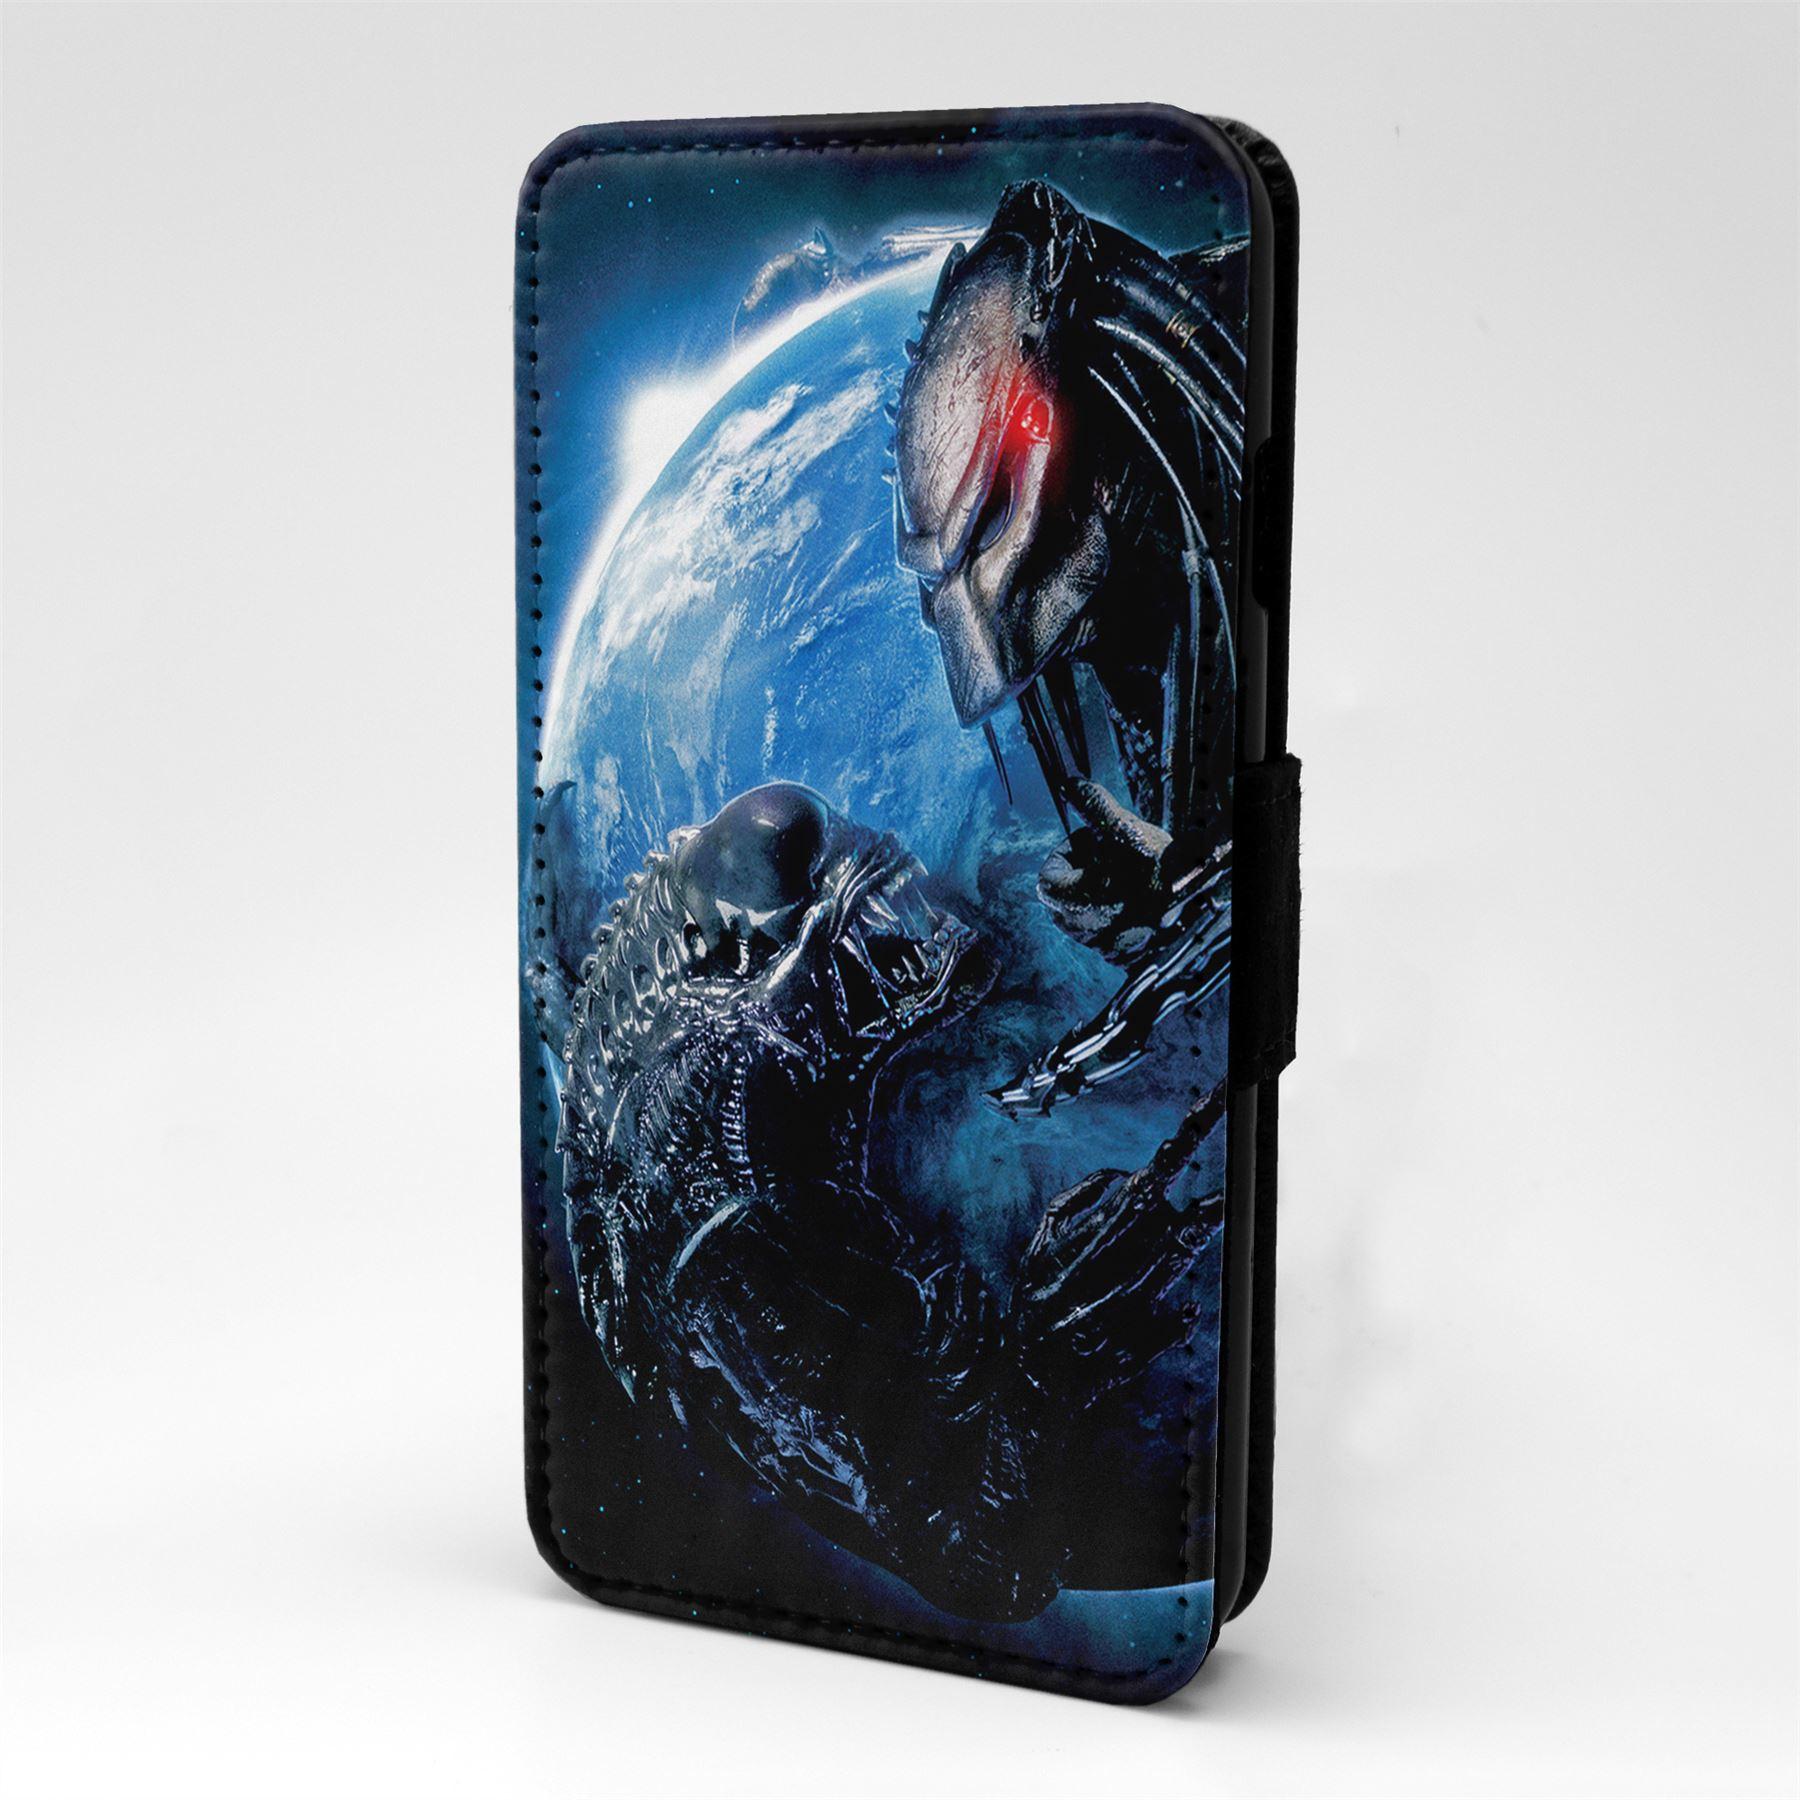 Alien-Vs-Predator-Flip-Case-Cover-For-Mobile-Phone-T1644